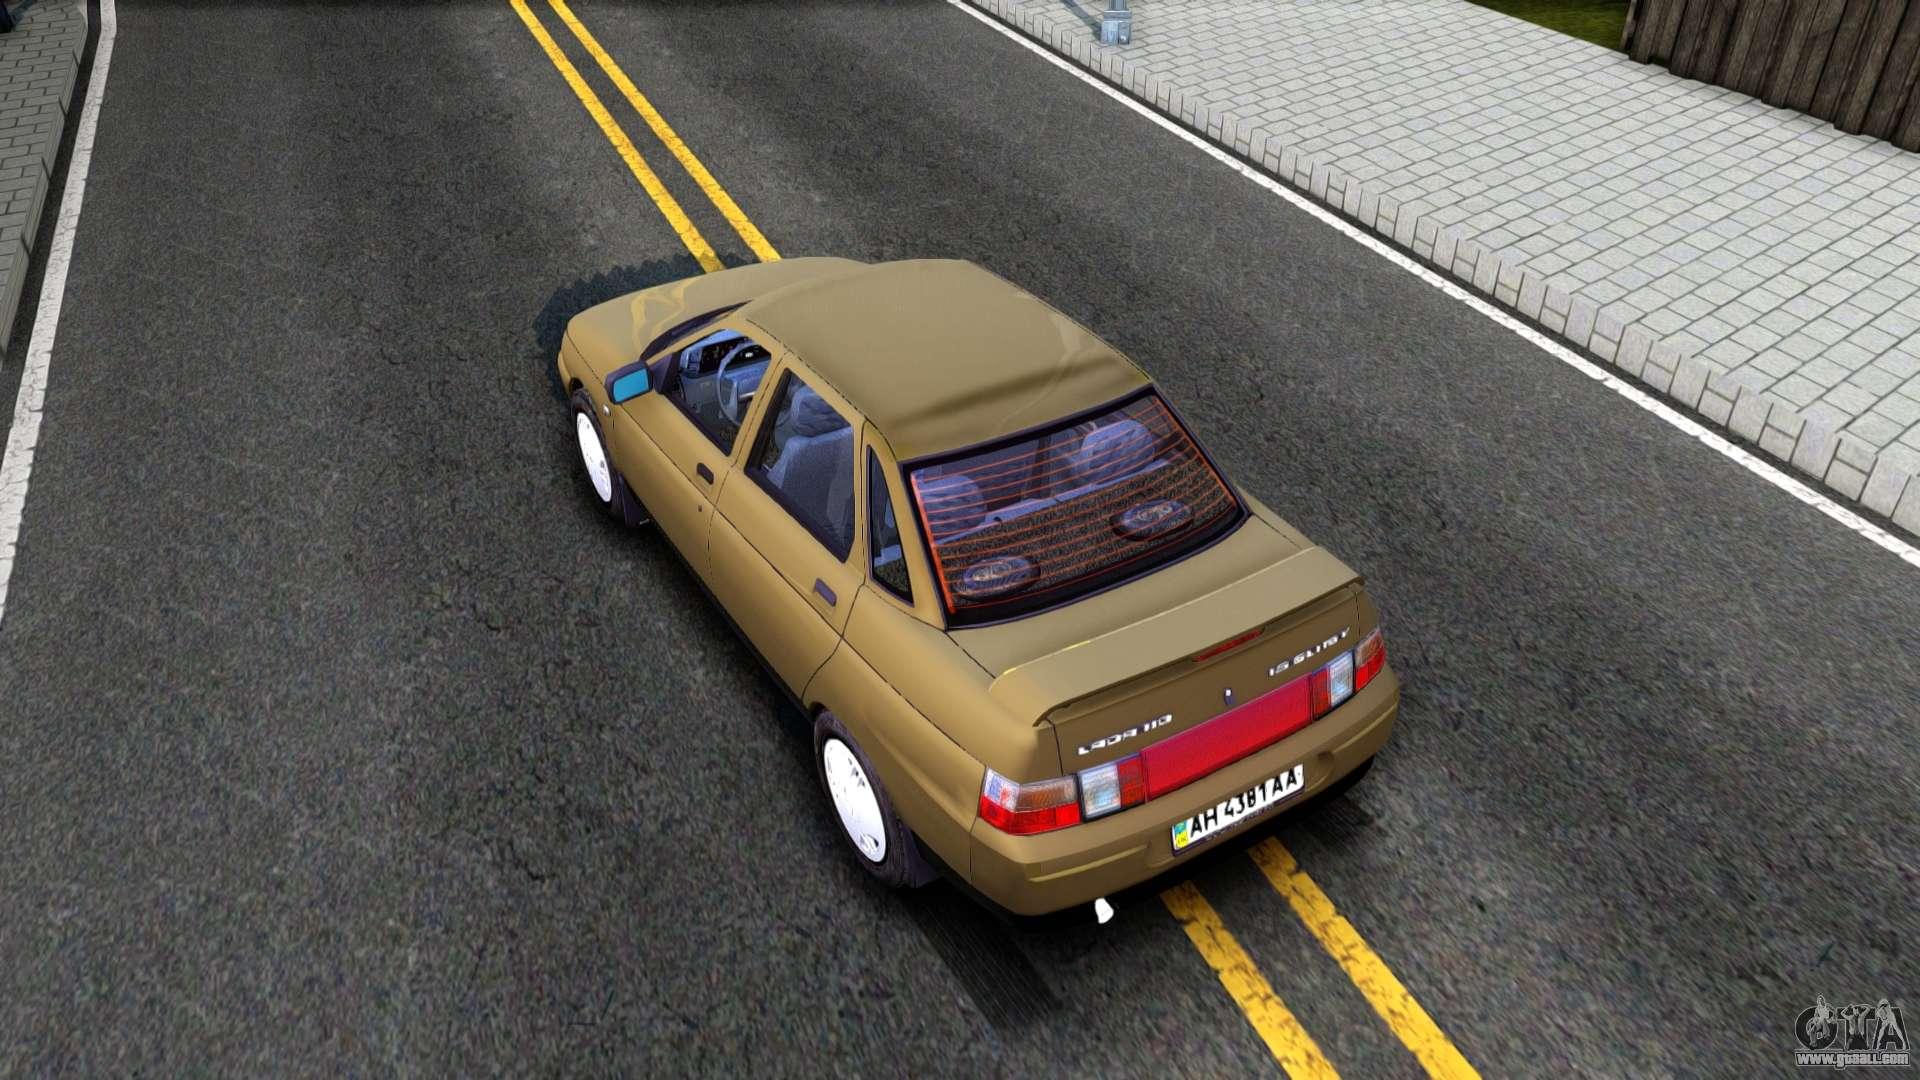 VAZ 21103 - the same ten, but better 83